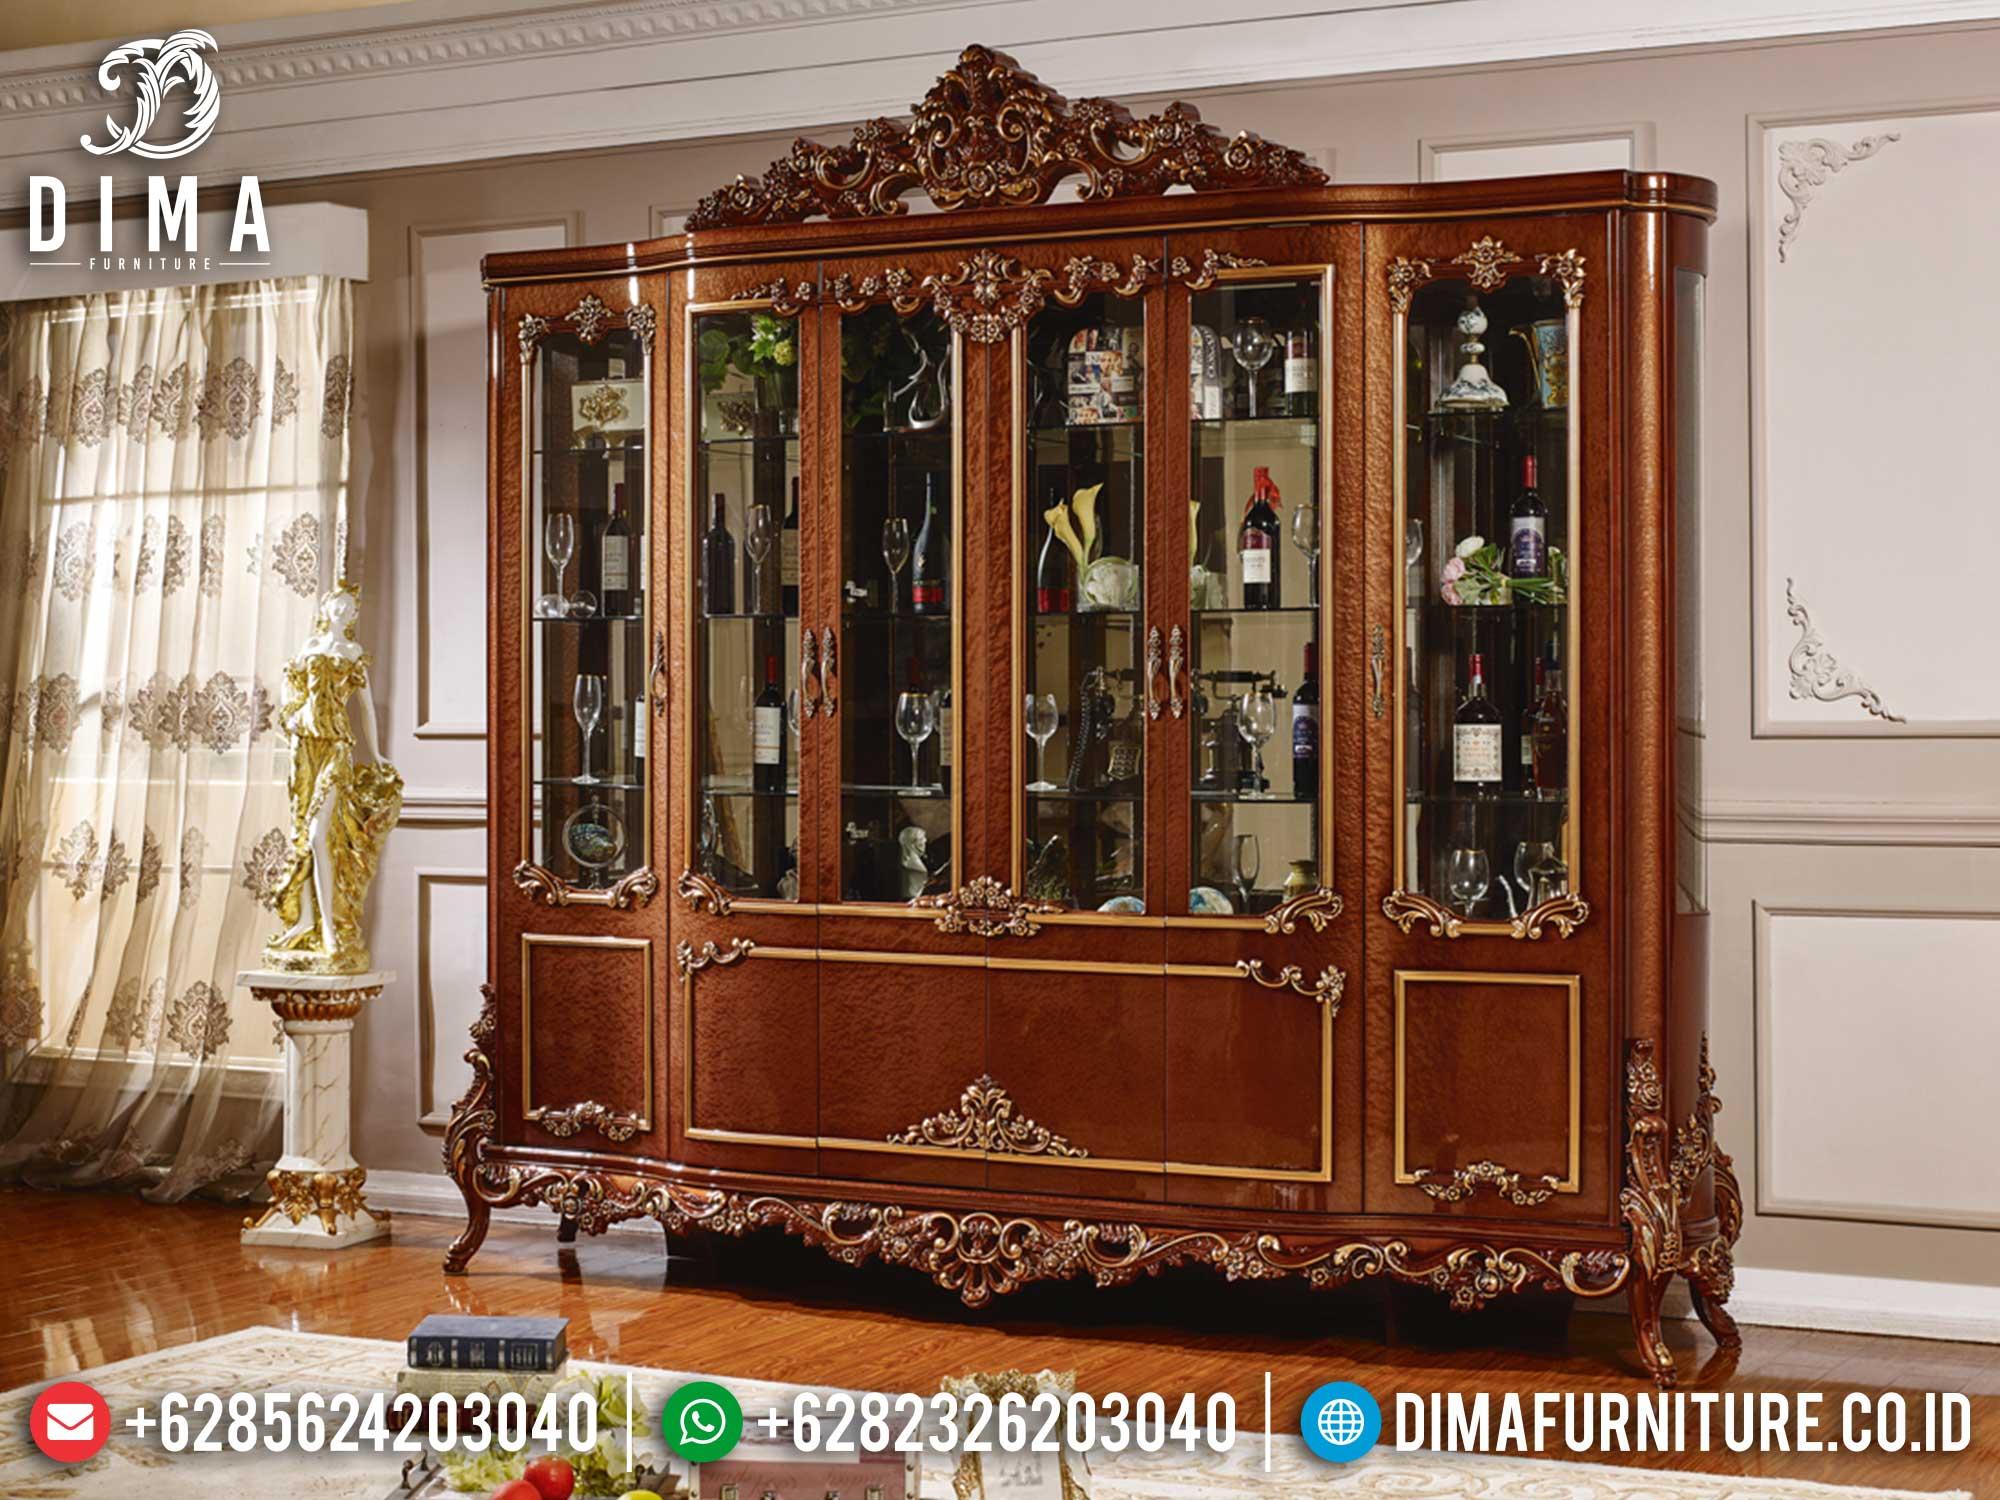 Desain Lemari Hias Mewah Jati Natural Kombinasi Elegant Style Luxury TTJ-1400